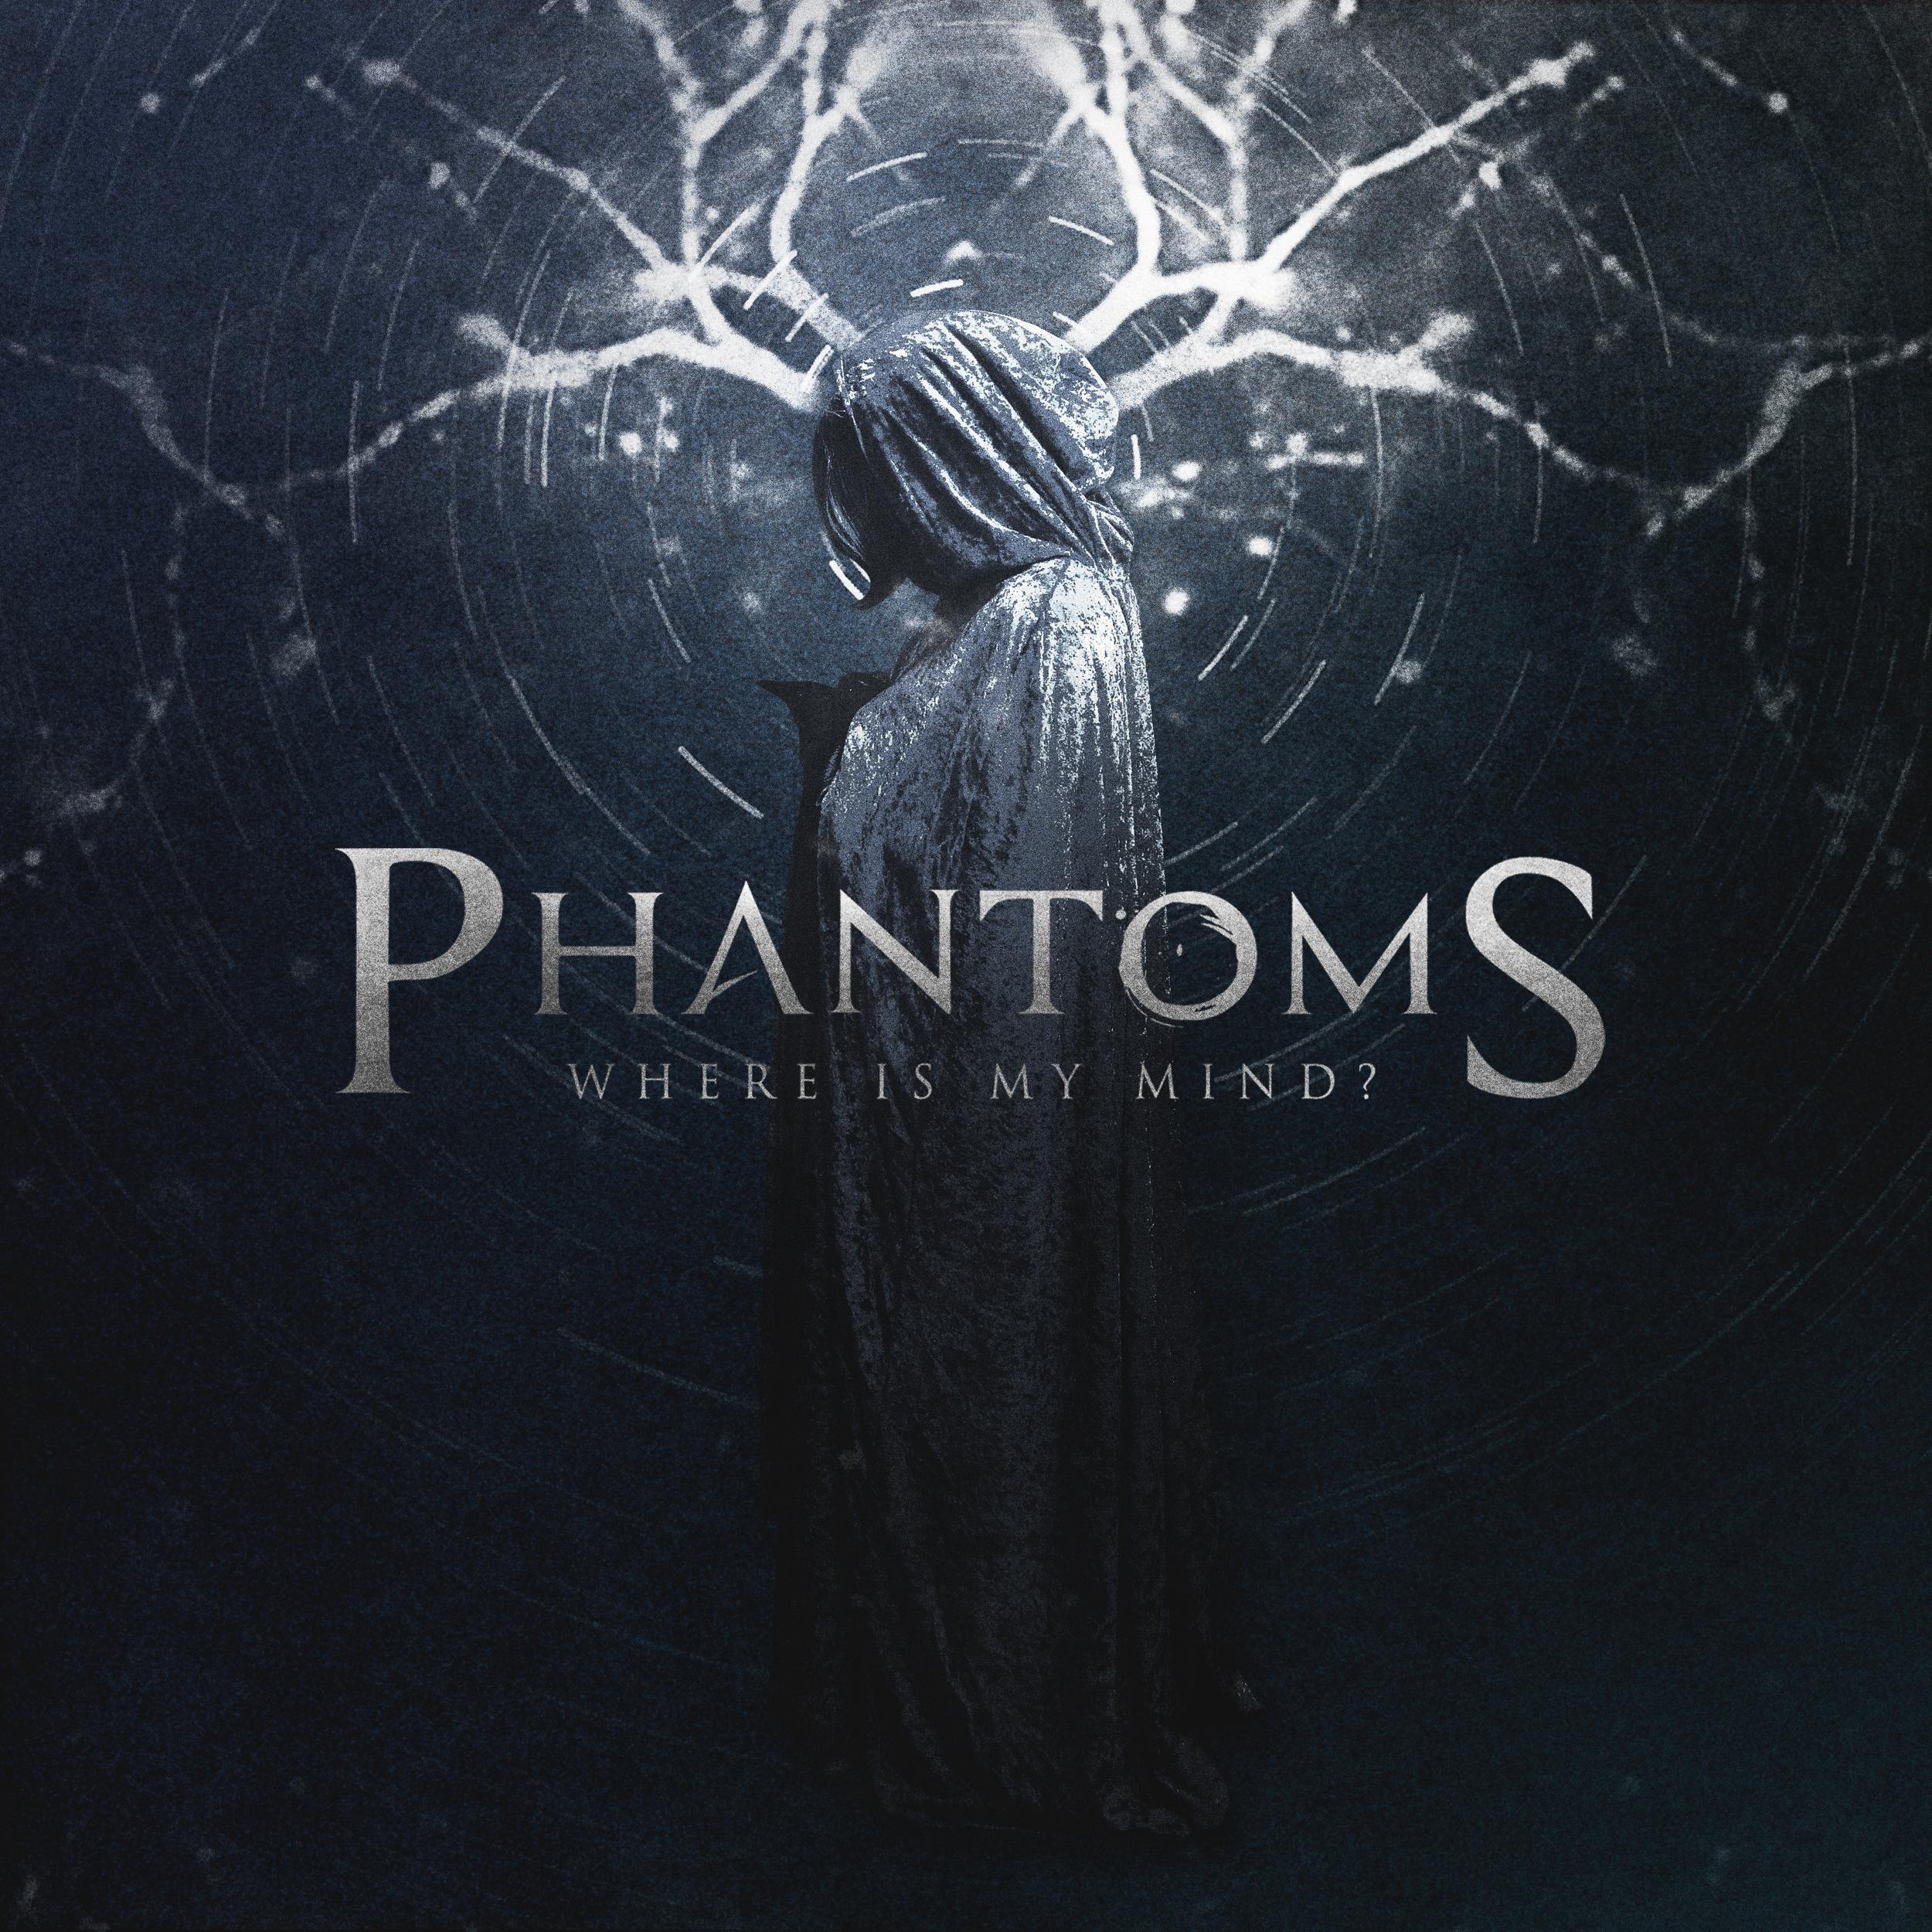 phantoms3.jpg